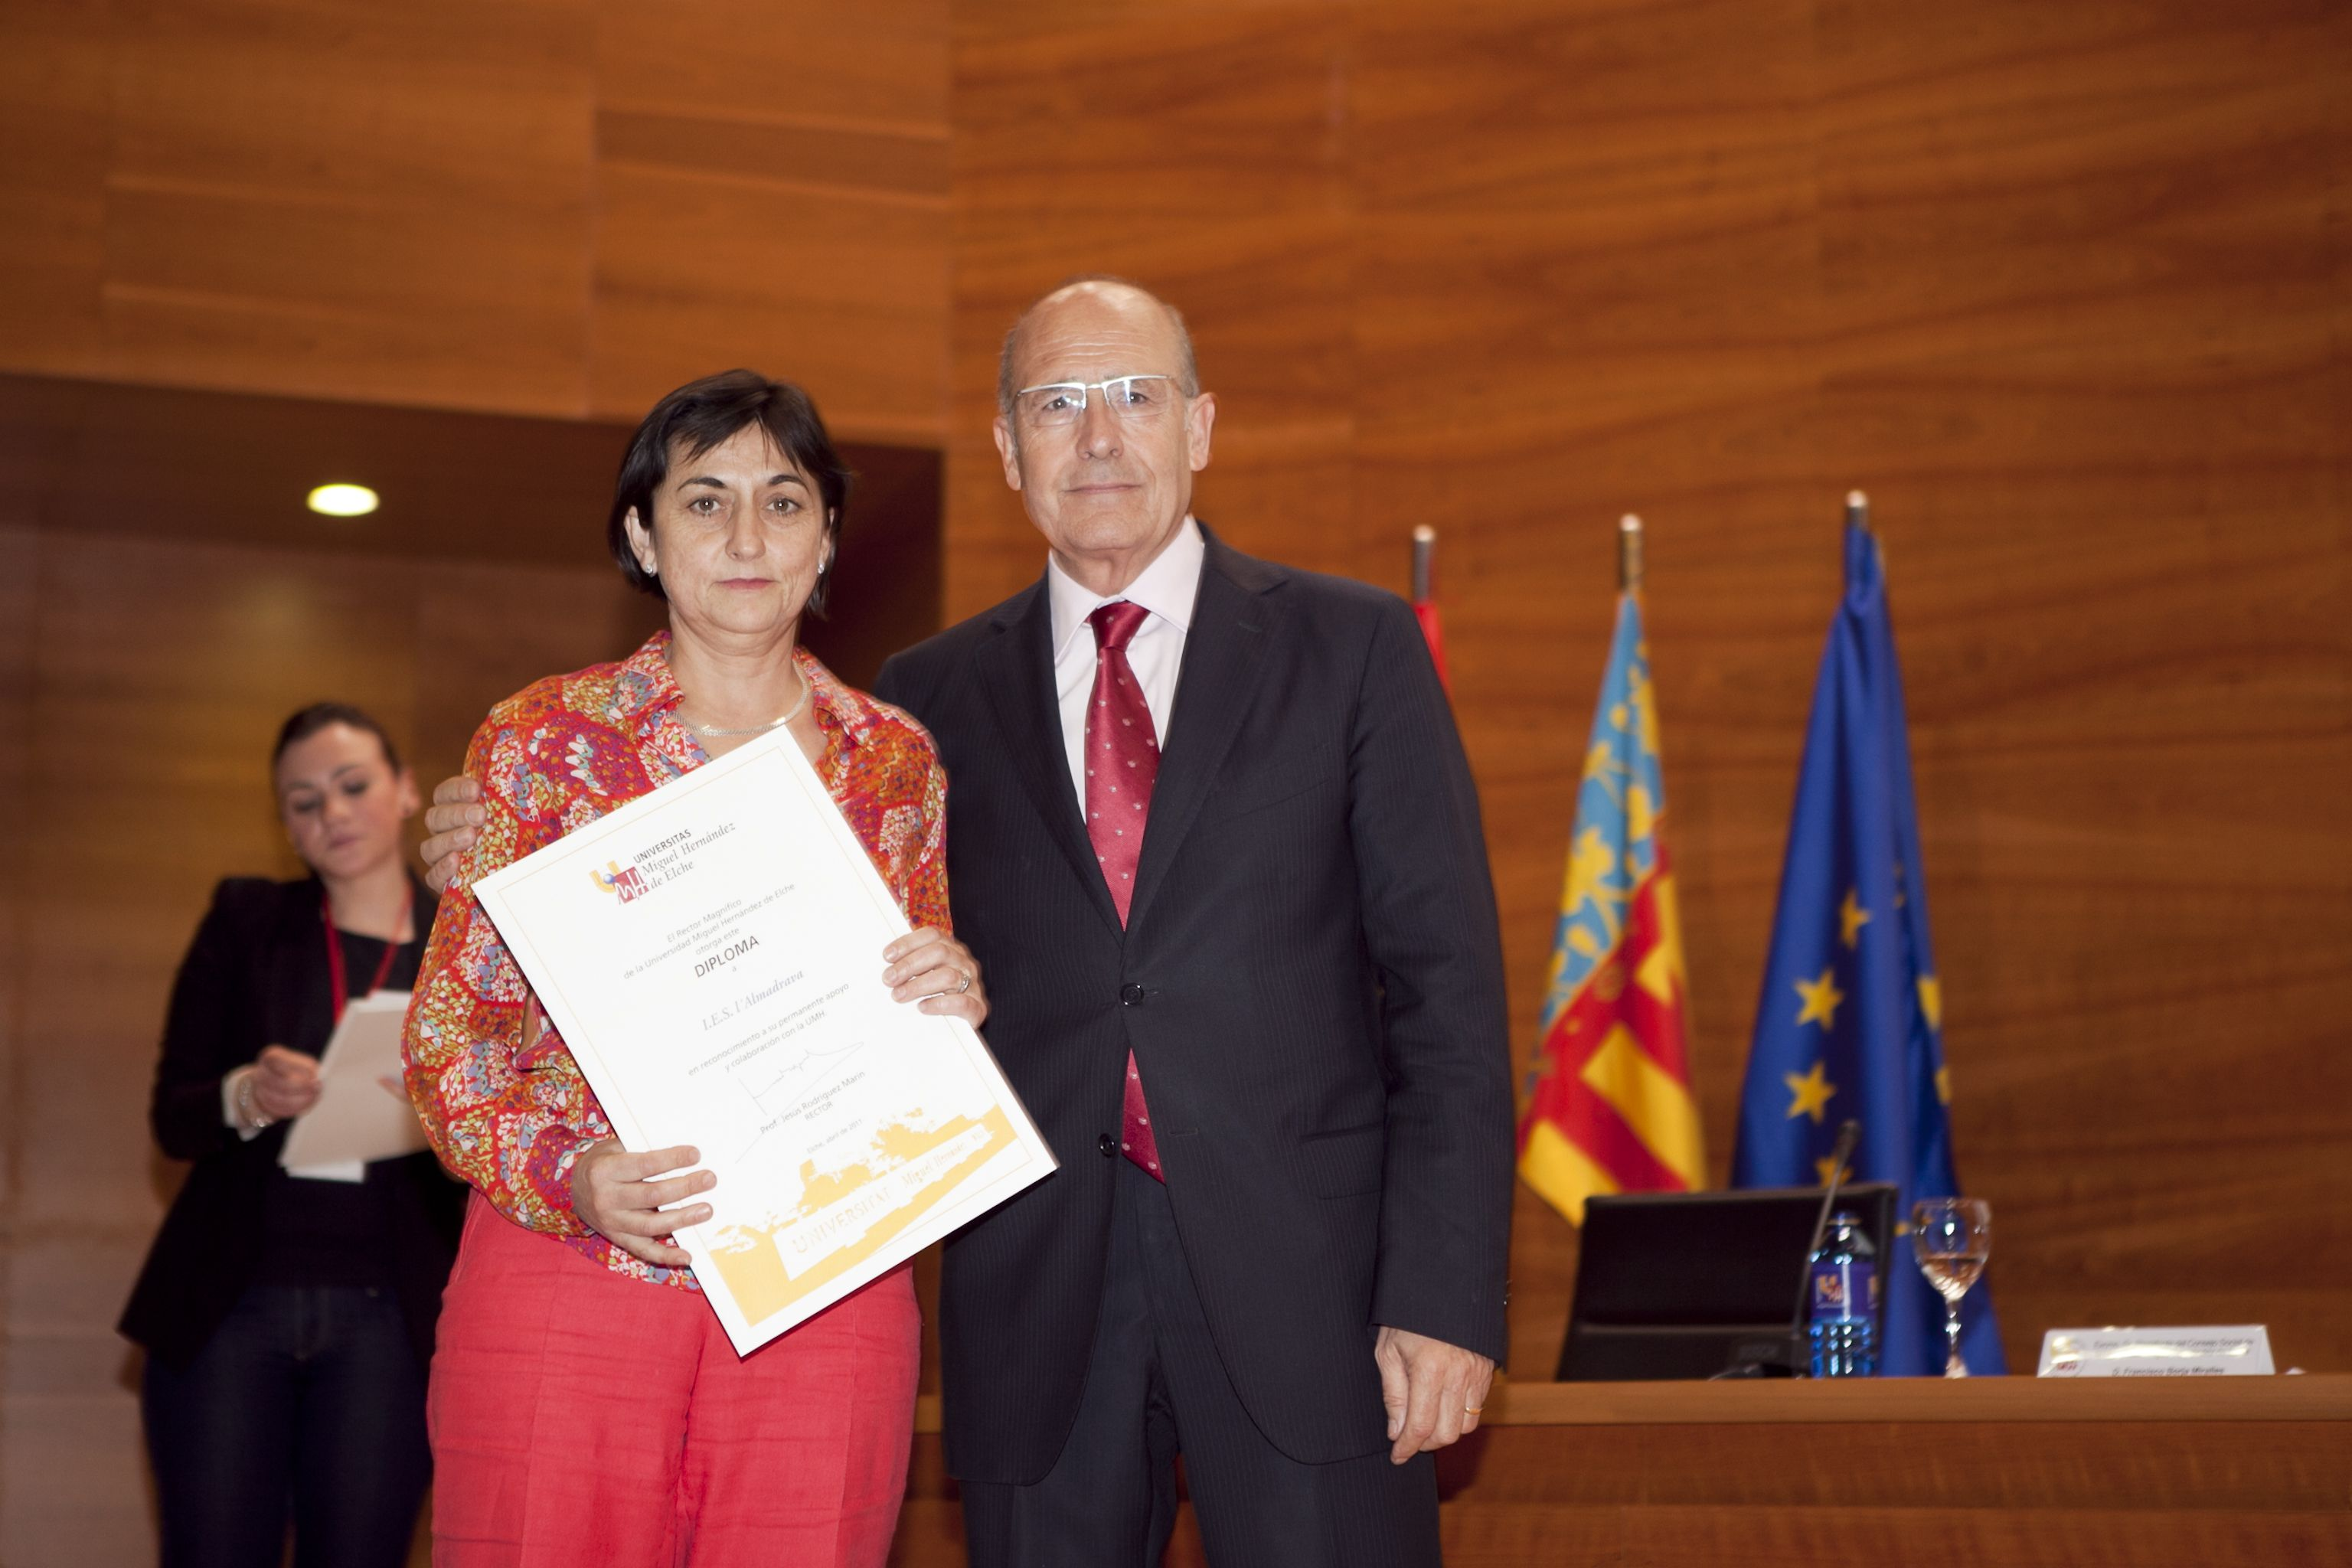 umh-diplomas-rector_mg_6707.jpg